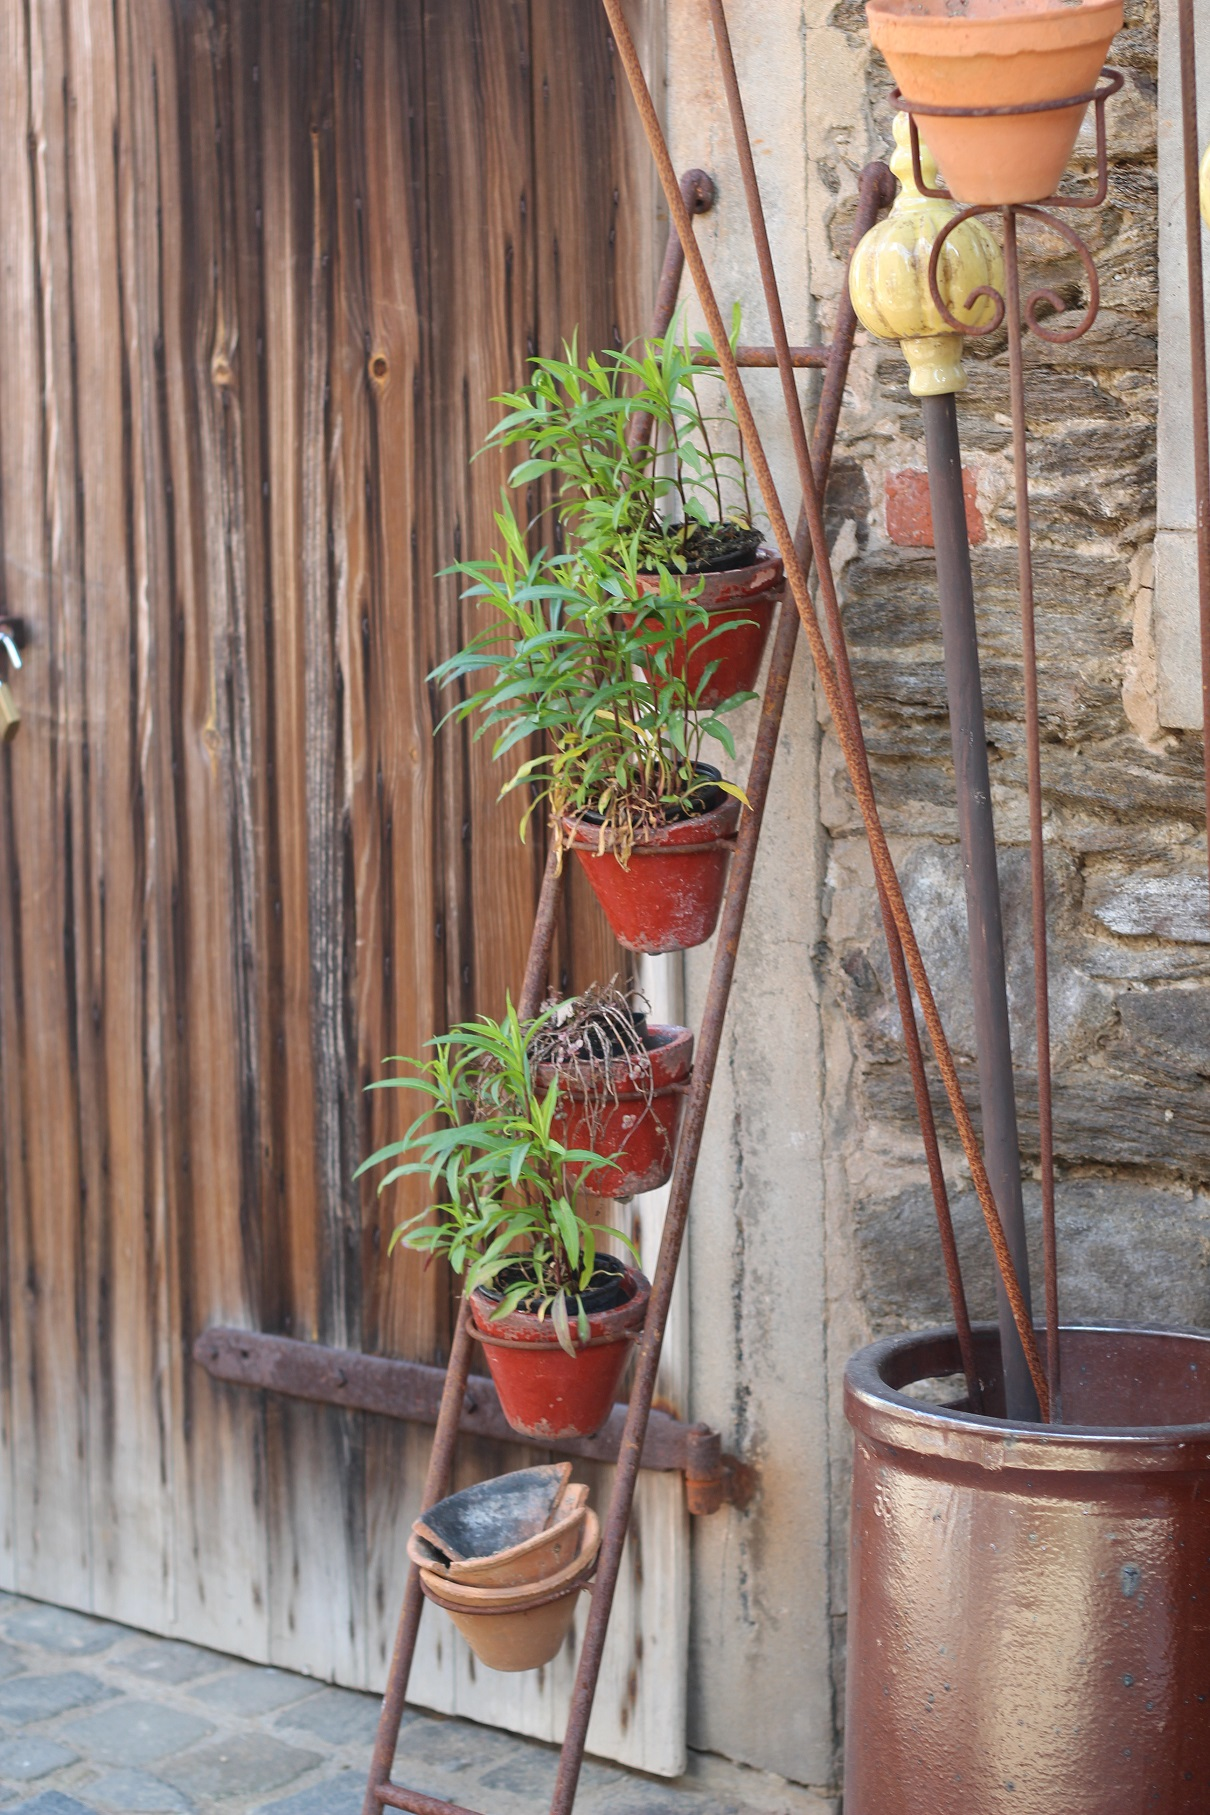 Topfleiter edelrost garten topfhalter shabby landhaus for Edelrost garten